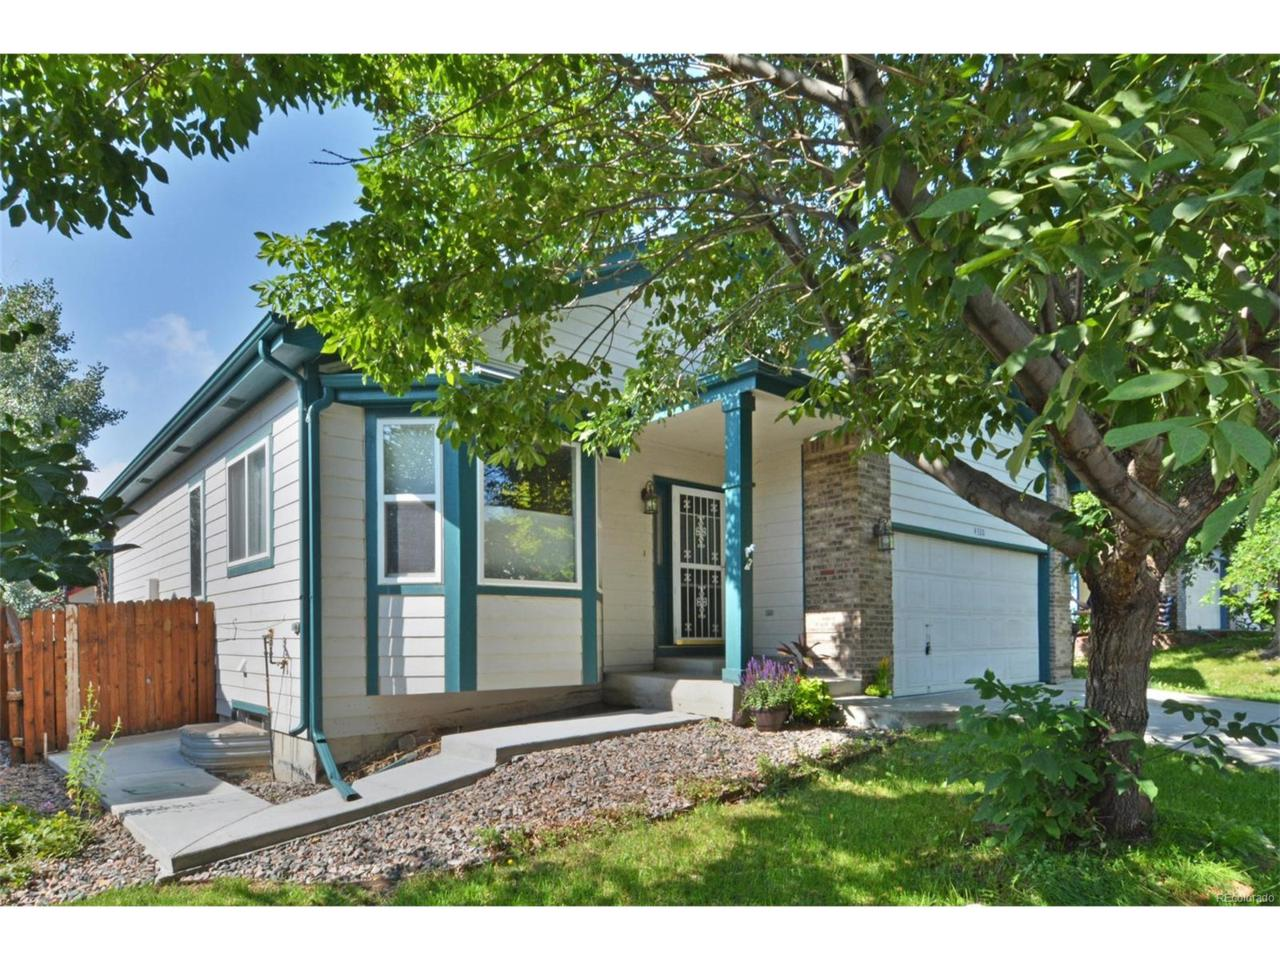 4320 Snowbird Avenue, Broomfield, CO 80020 (MLS #3087920) :: 8z Real Estate